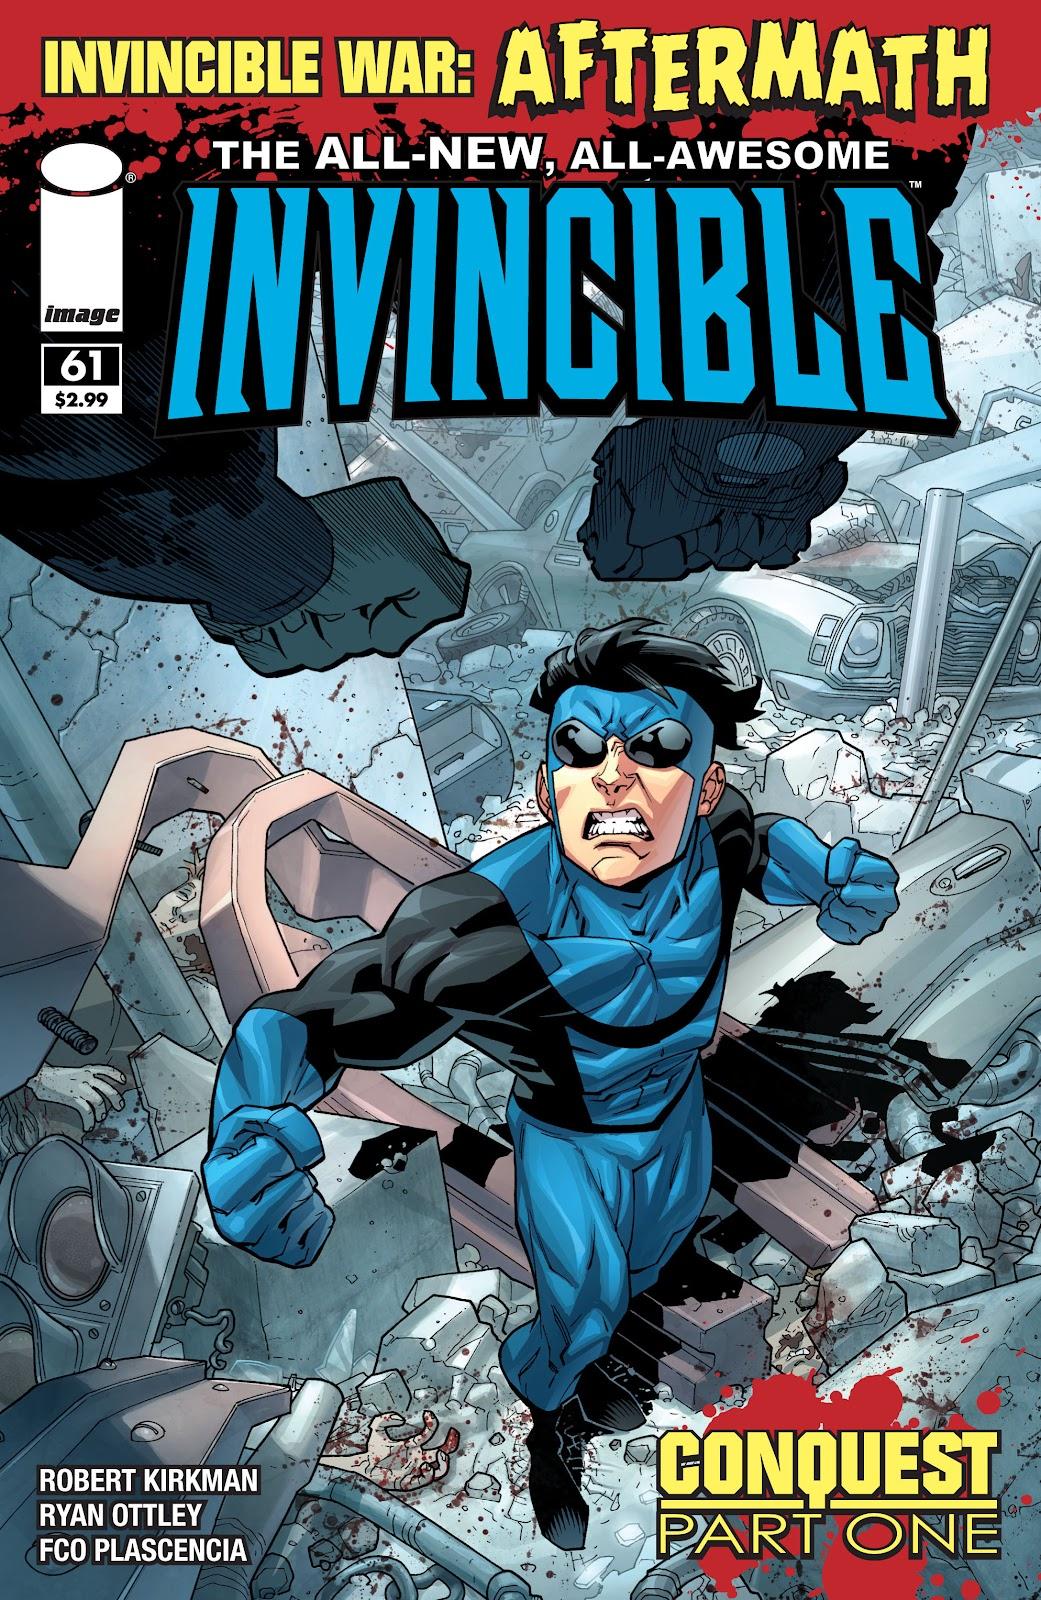 Invincible (2003) 61 Page 1